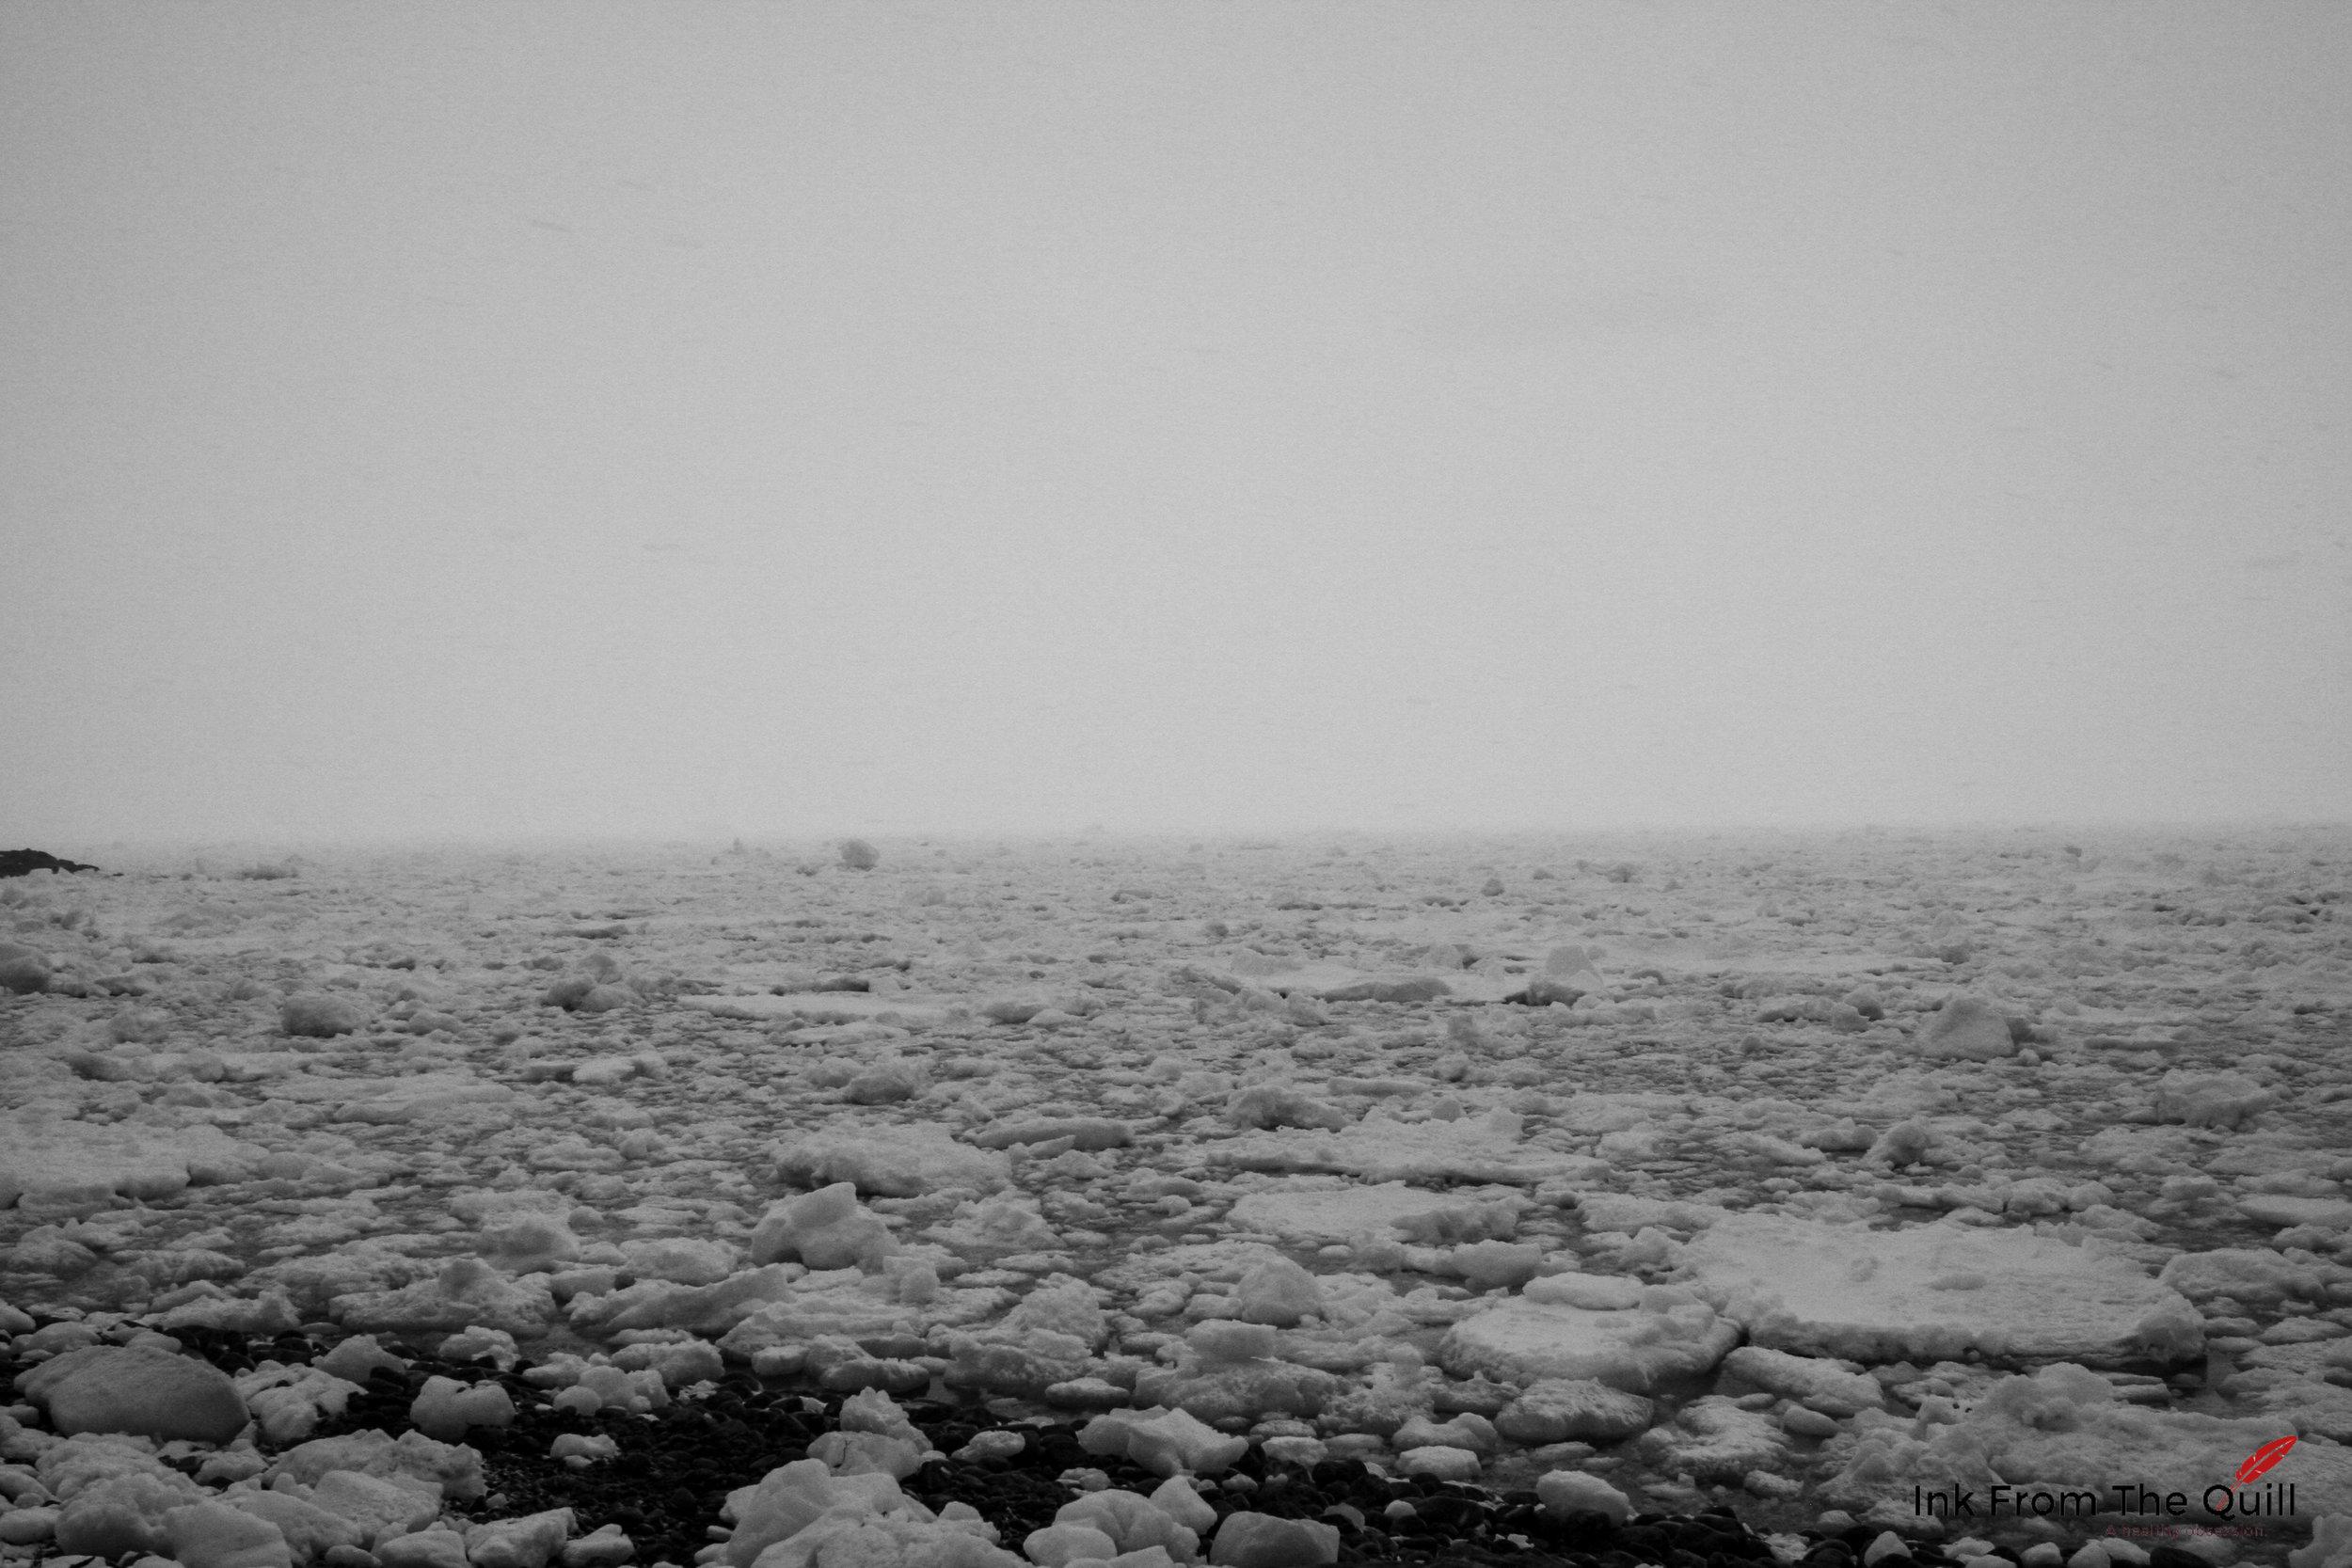 Sea ice in Portugal Cove, Newfoundland